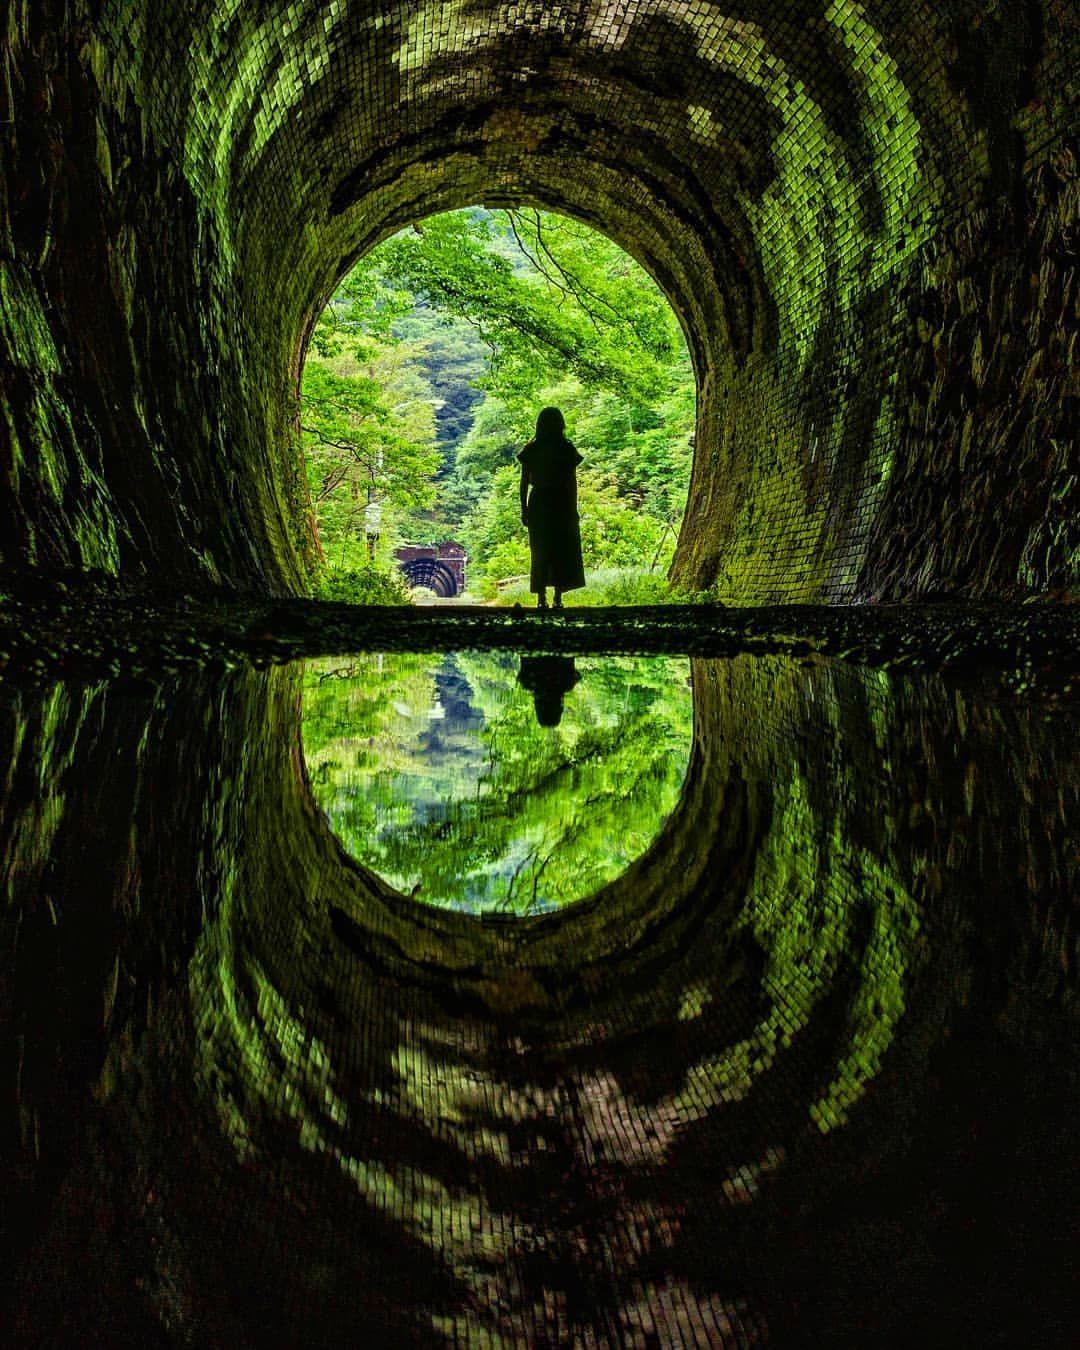 Oo9ma On Instagram 今日は の誕生日でした 娘ちゃんとデート モデルになってもらいました ところでカスって何 今日の景色 水たまり トンネル 小刀根トンネル 廃線跡 北陸本線 柳ケ瀬線 リフレクション キタムラ写真投稿 ニコン倶楽部 Land トンネル